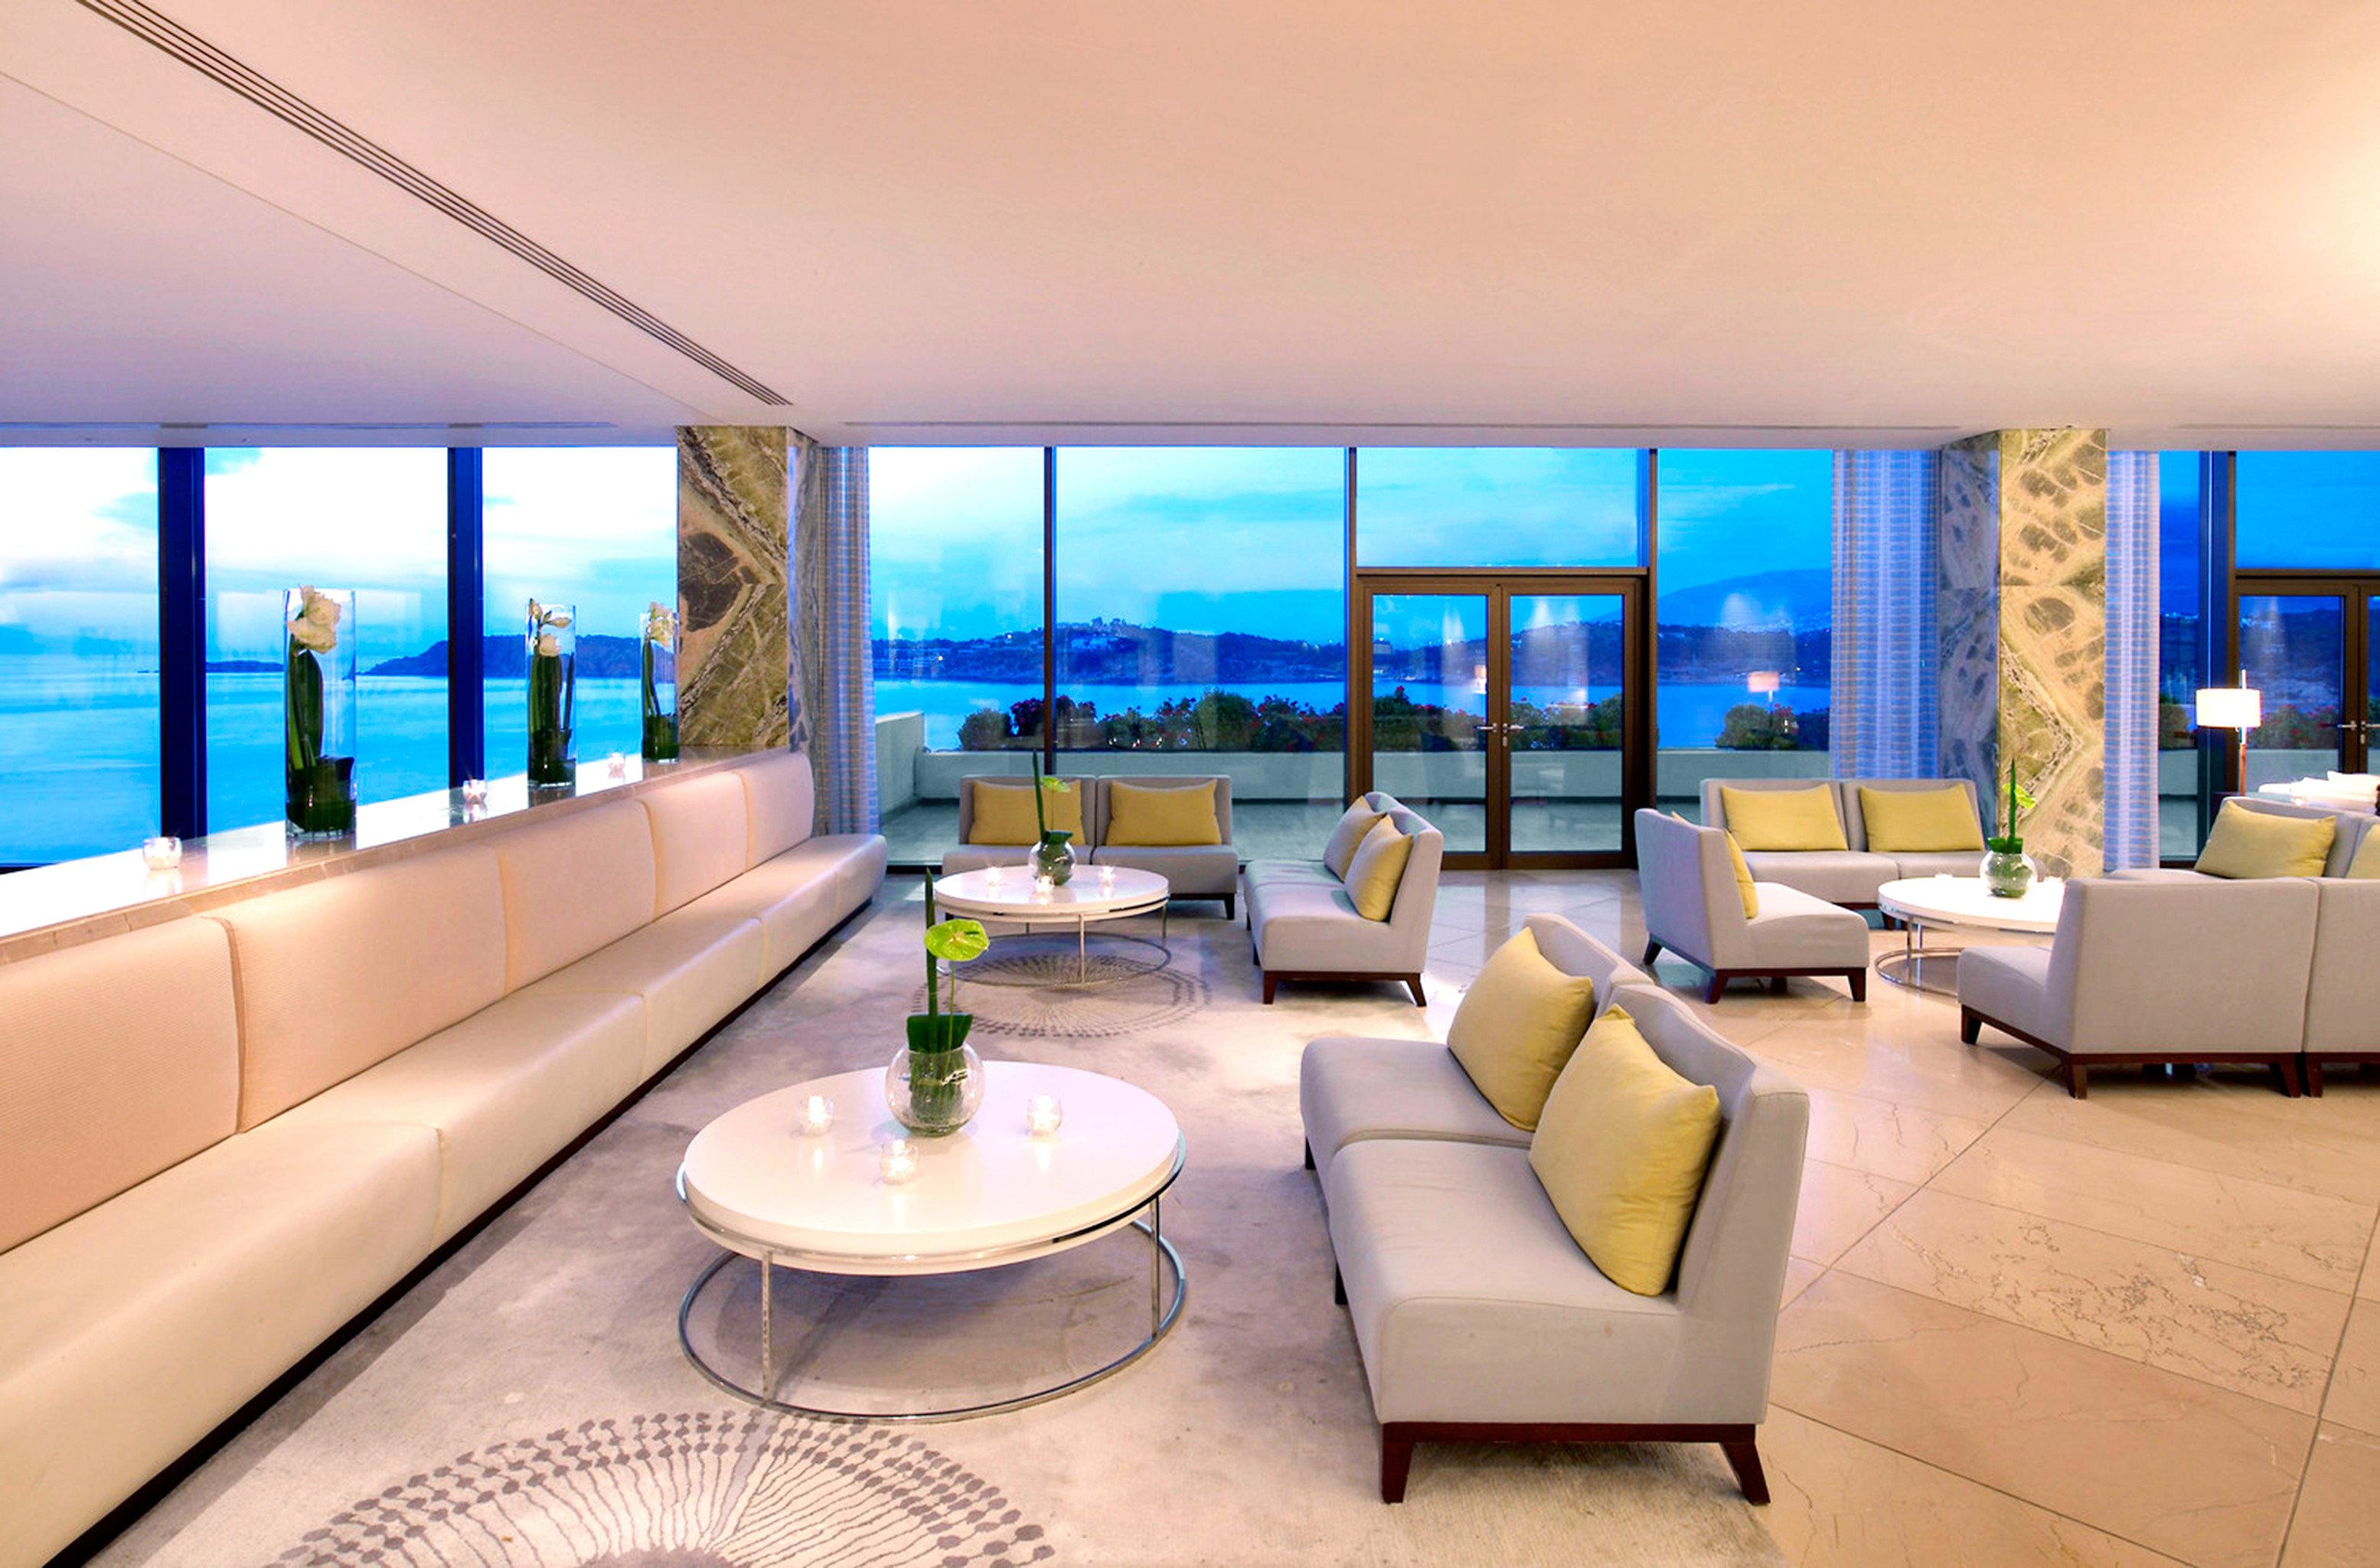 Hip Lounge Luxury Modern property condominium swimming pool Suite living room Villa Resort home